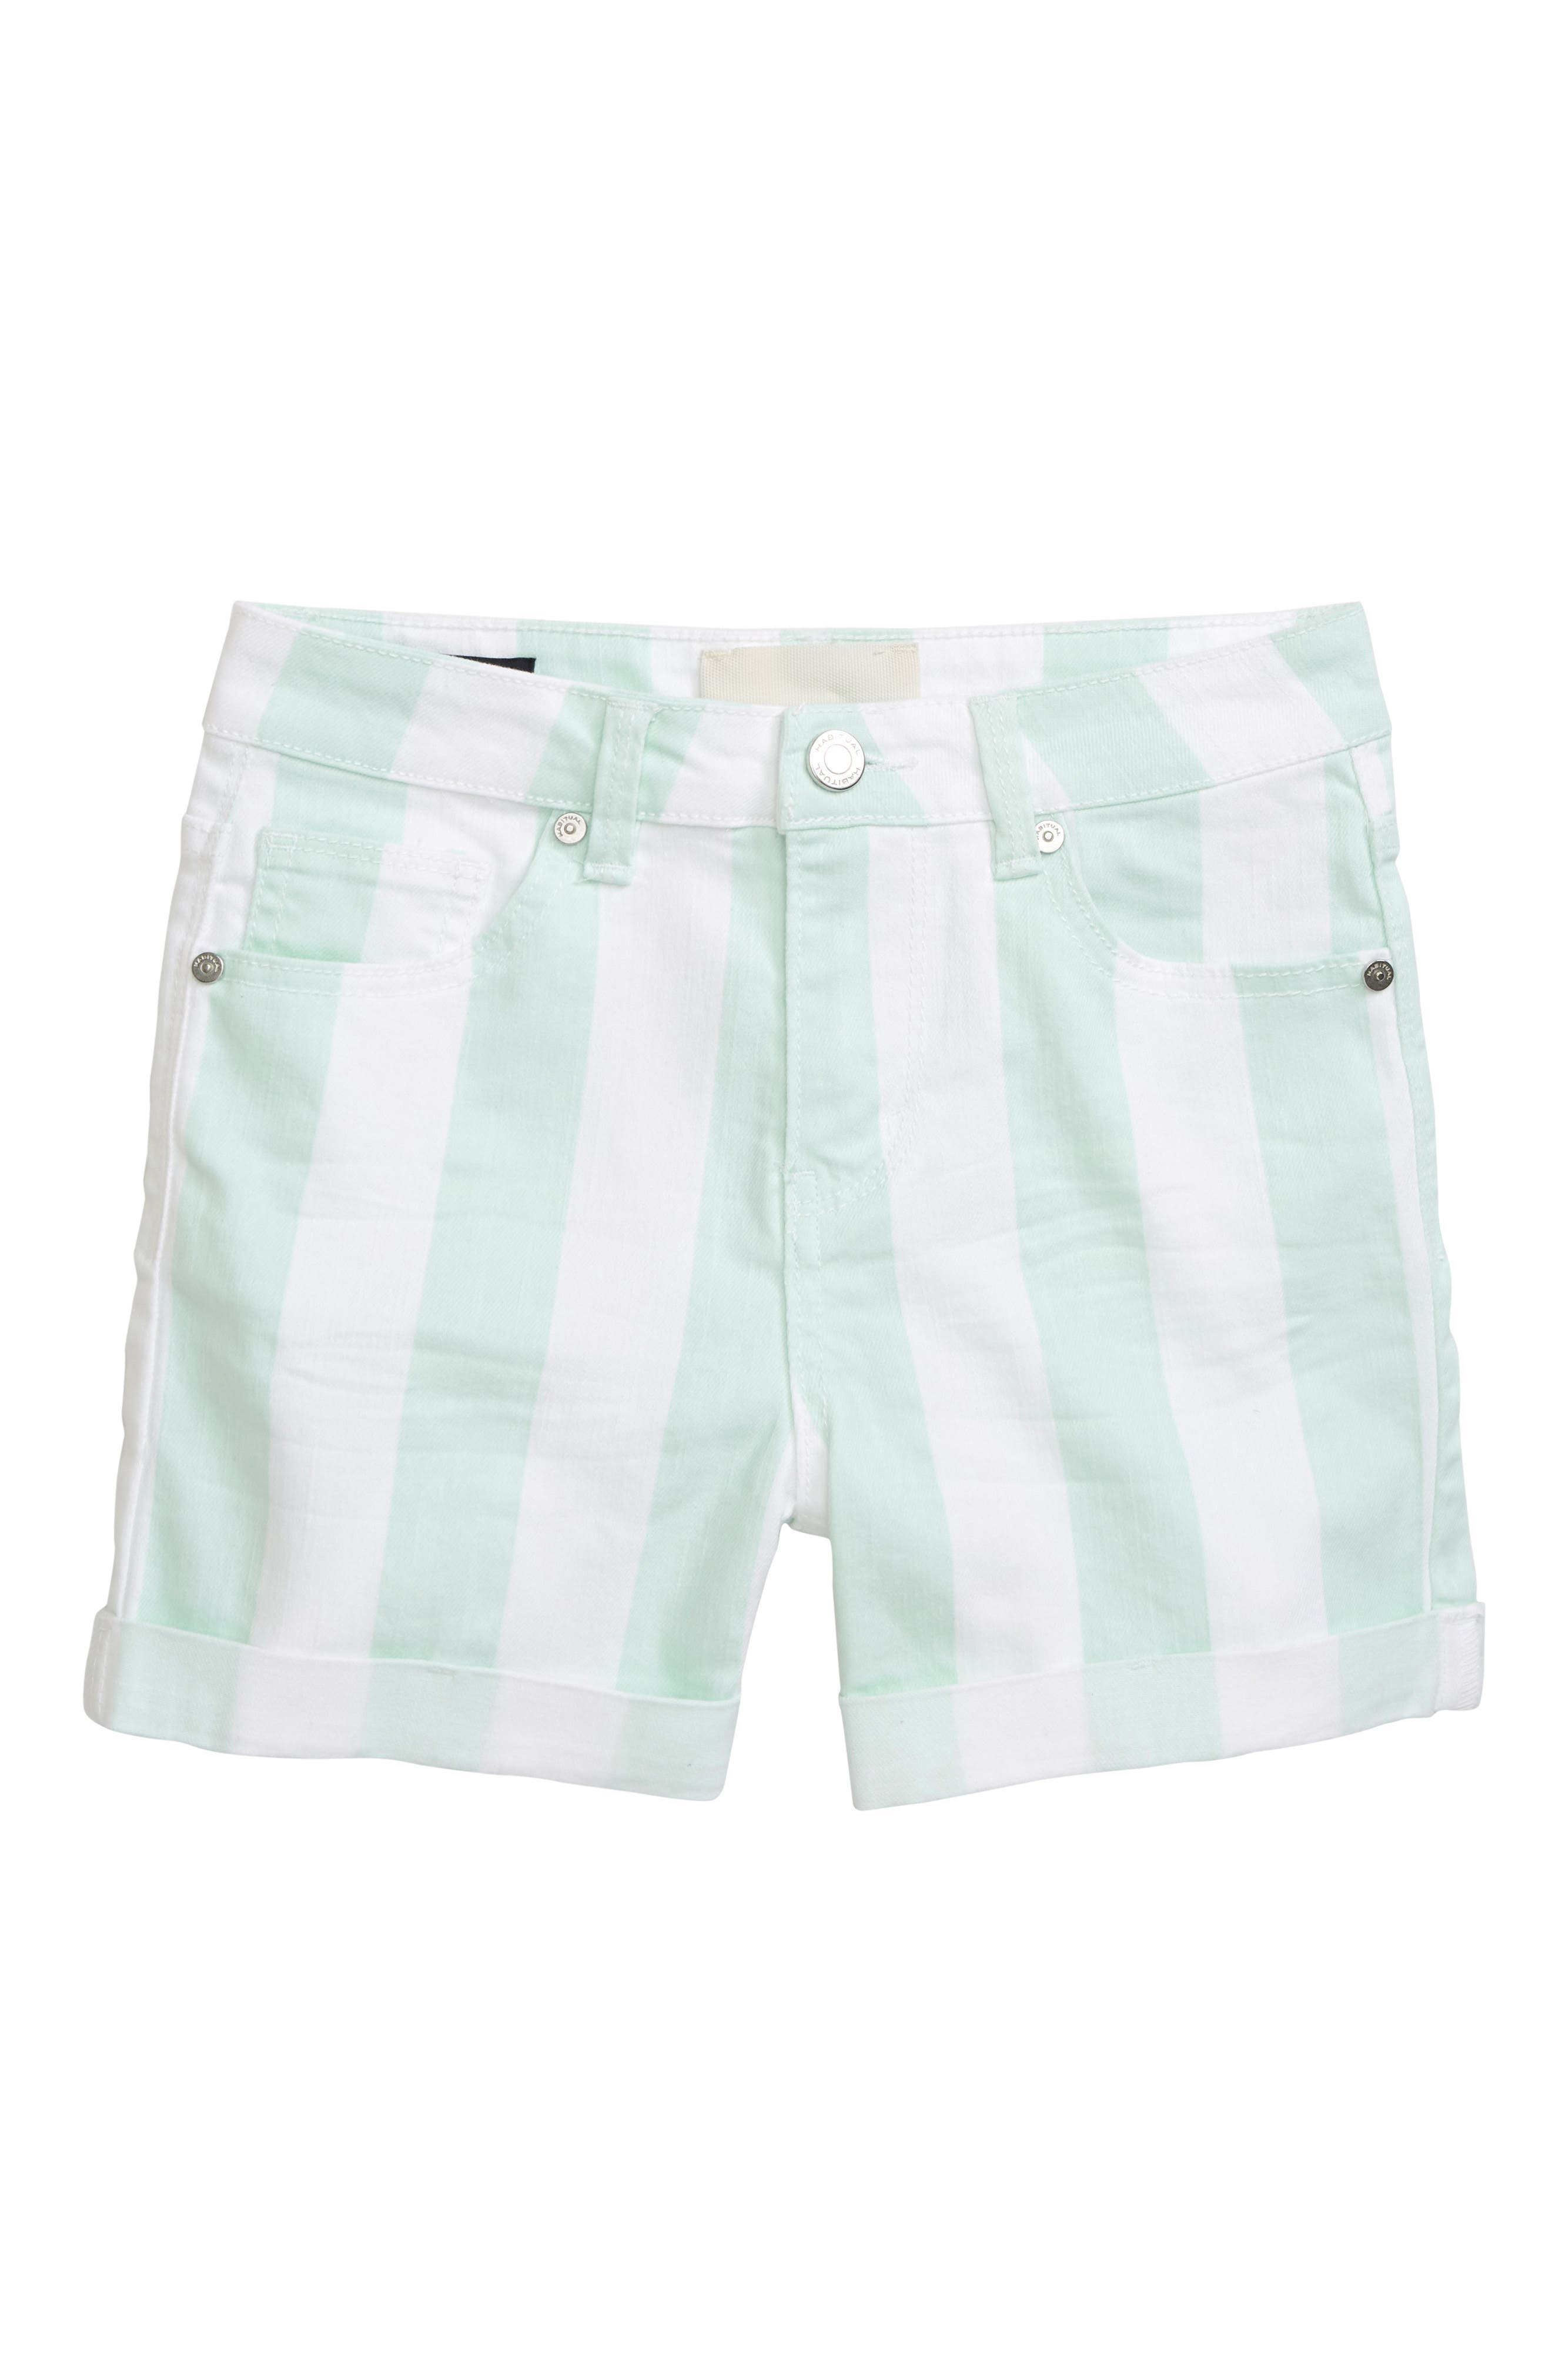 Girls Habitual Girl Dolly Stripe Cuffed Shorts Size 12  Bluegreen